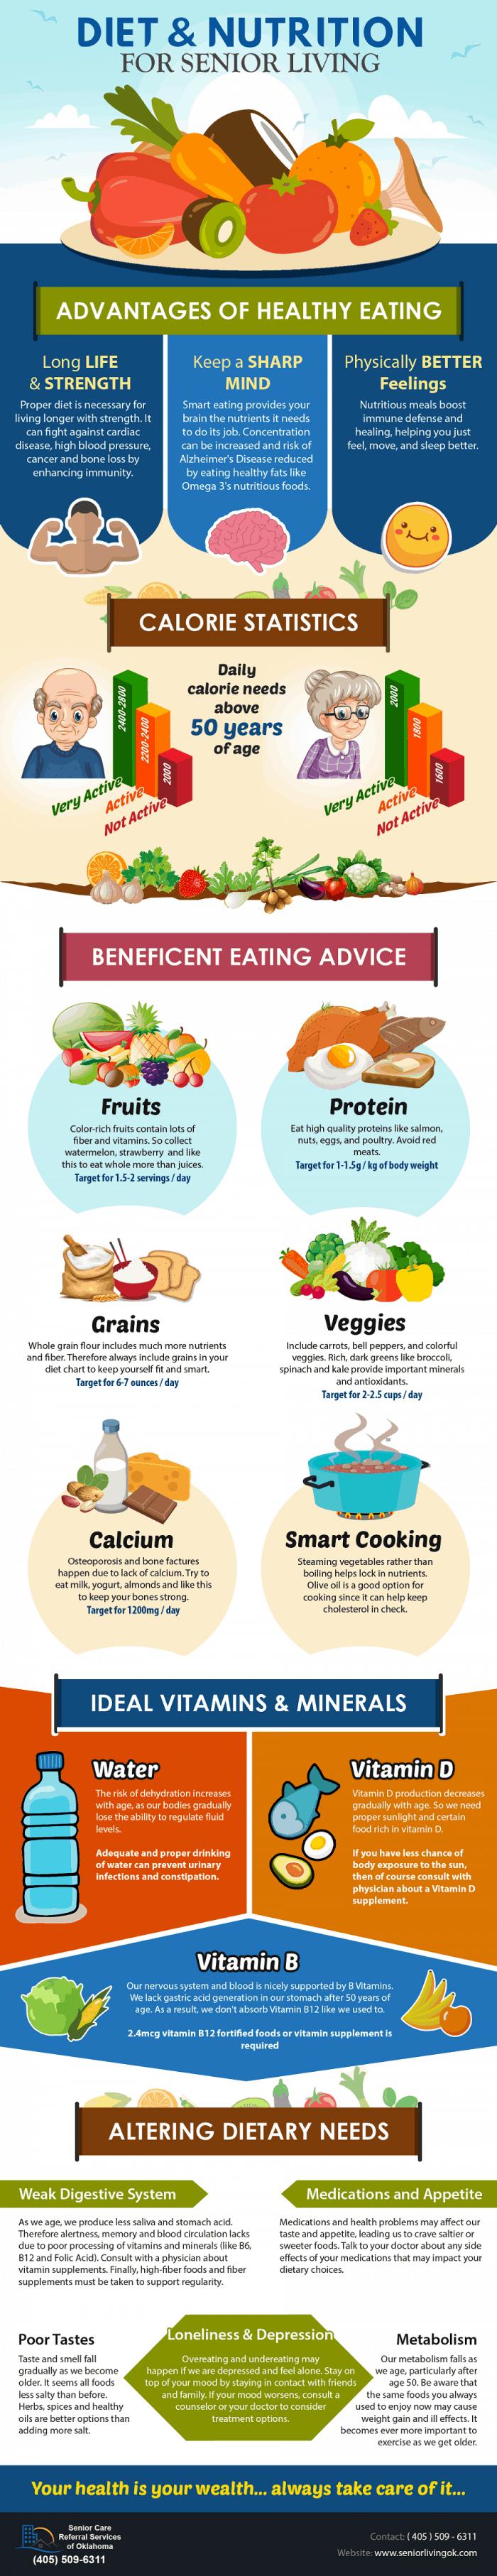 Healthy Eating Strategies For Seniors